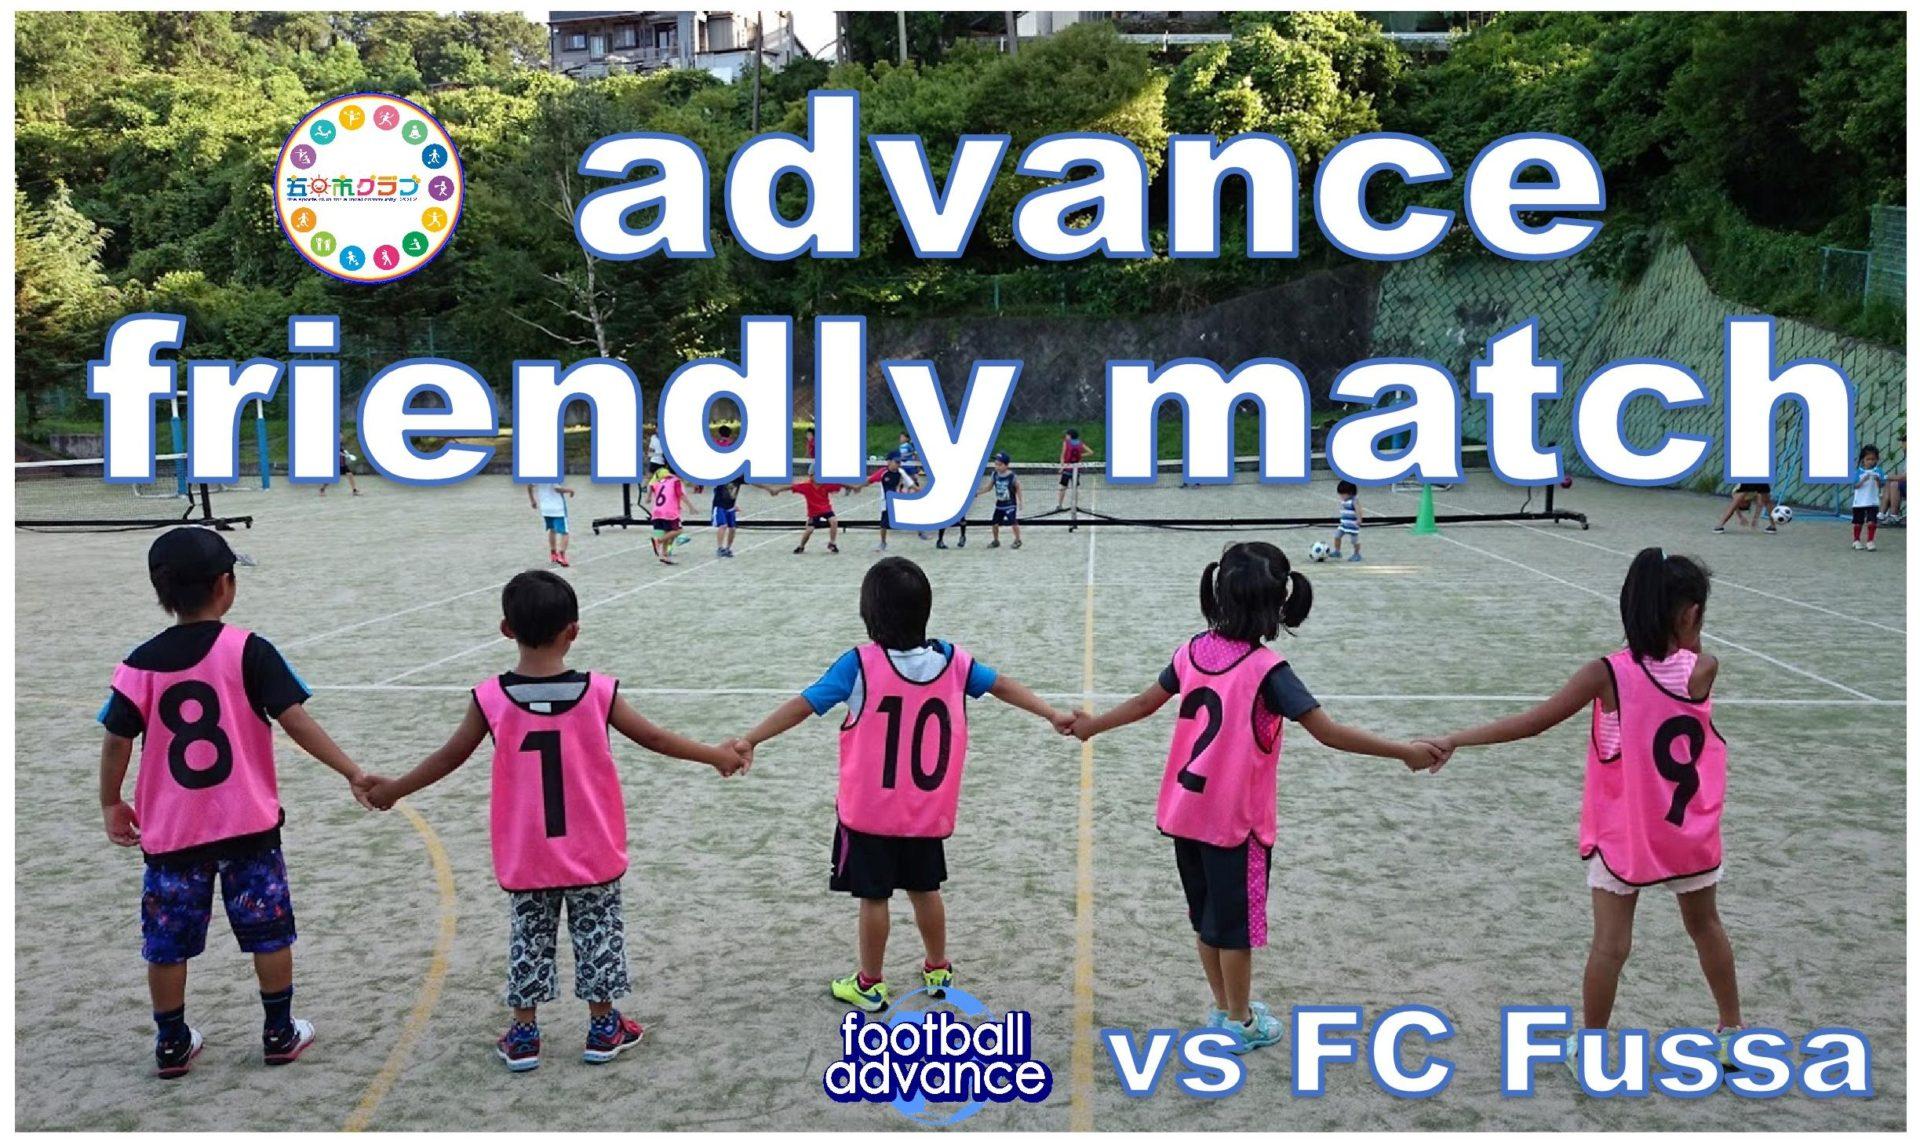 advance friendly match開催のご案内